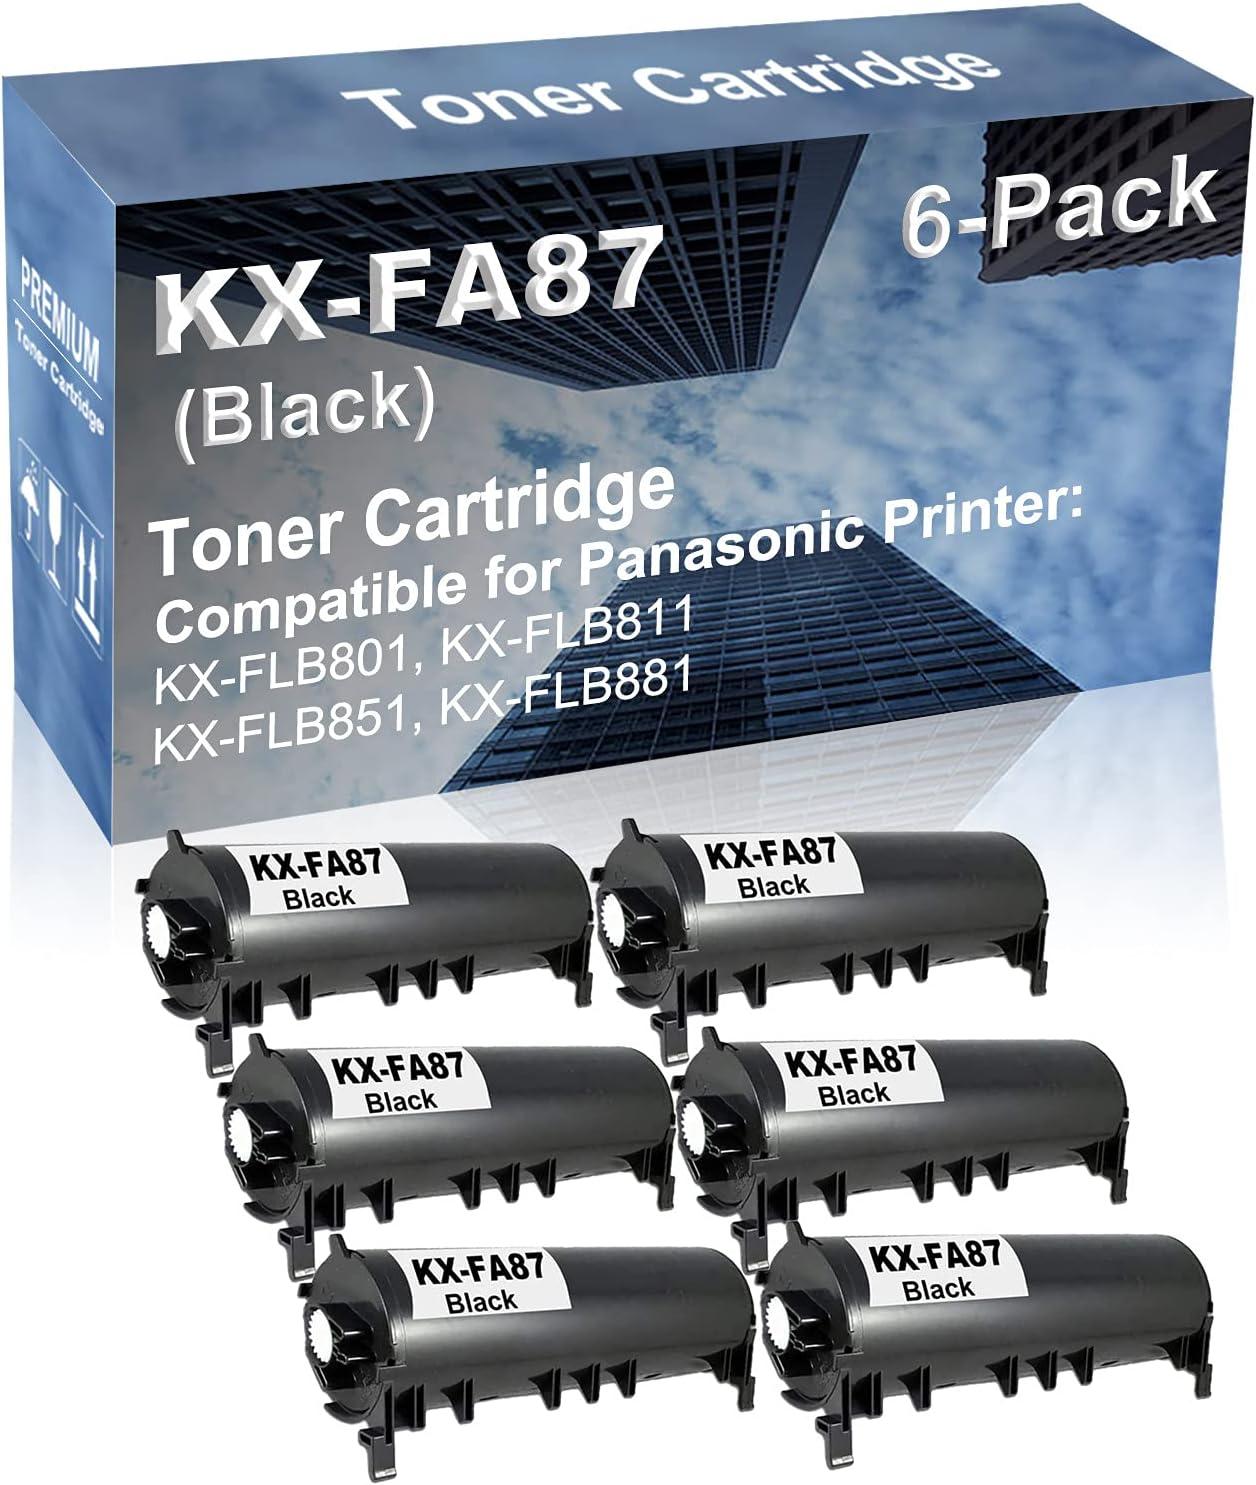 6-Pack Compatible High Yield KX-FLB801, KX-FLB811, KX-FLB851, KX-FLB881 Printer Cartridge Replacement for Panasonic KX-FA87 Toner Cartridge (Black)